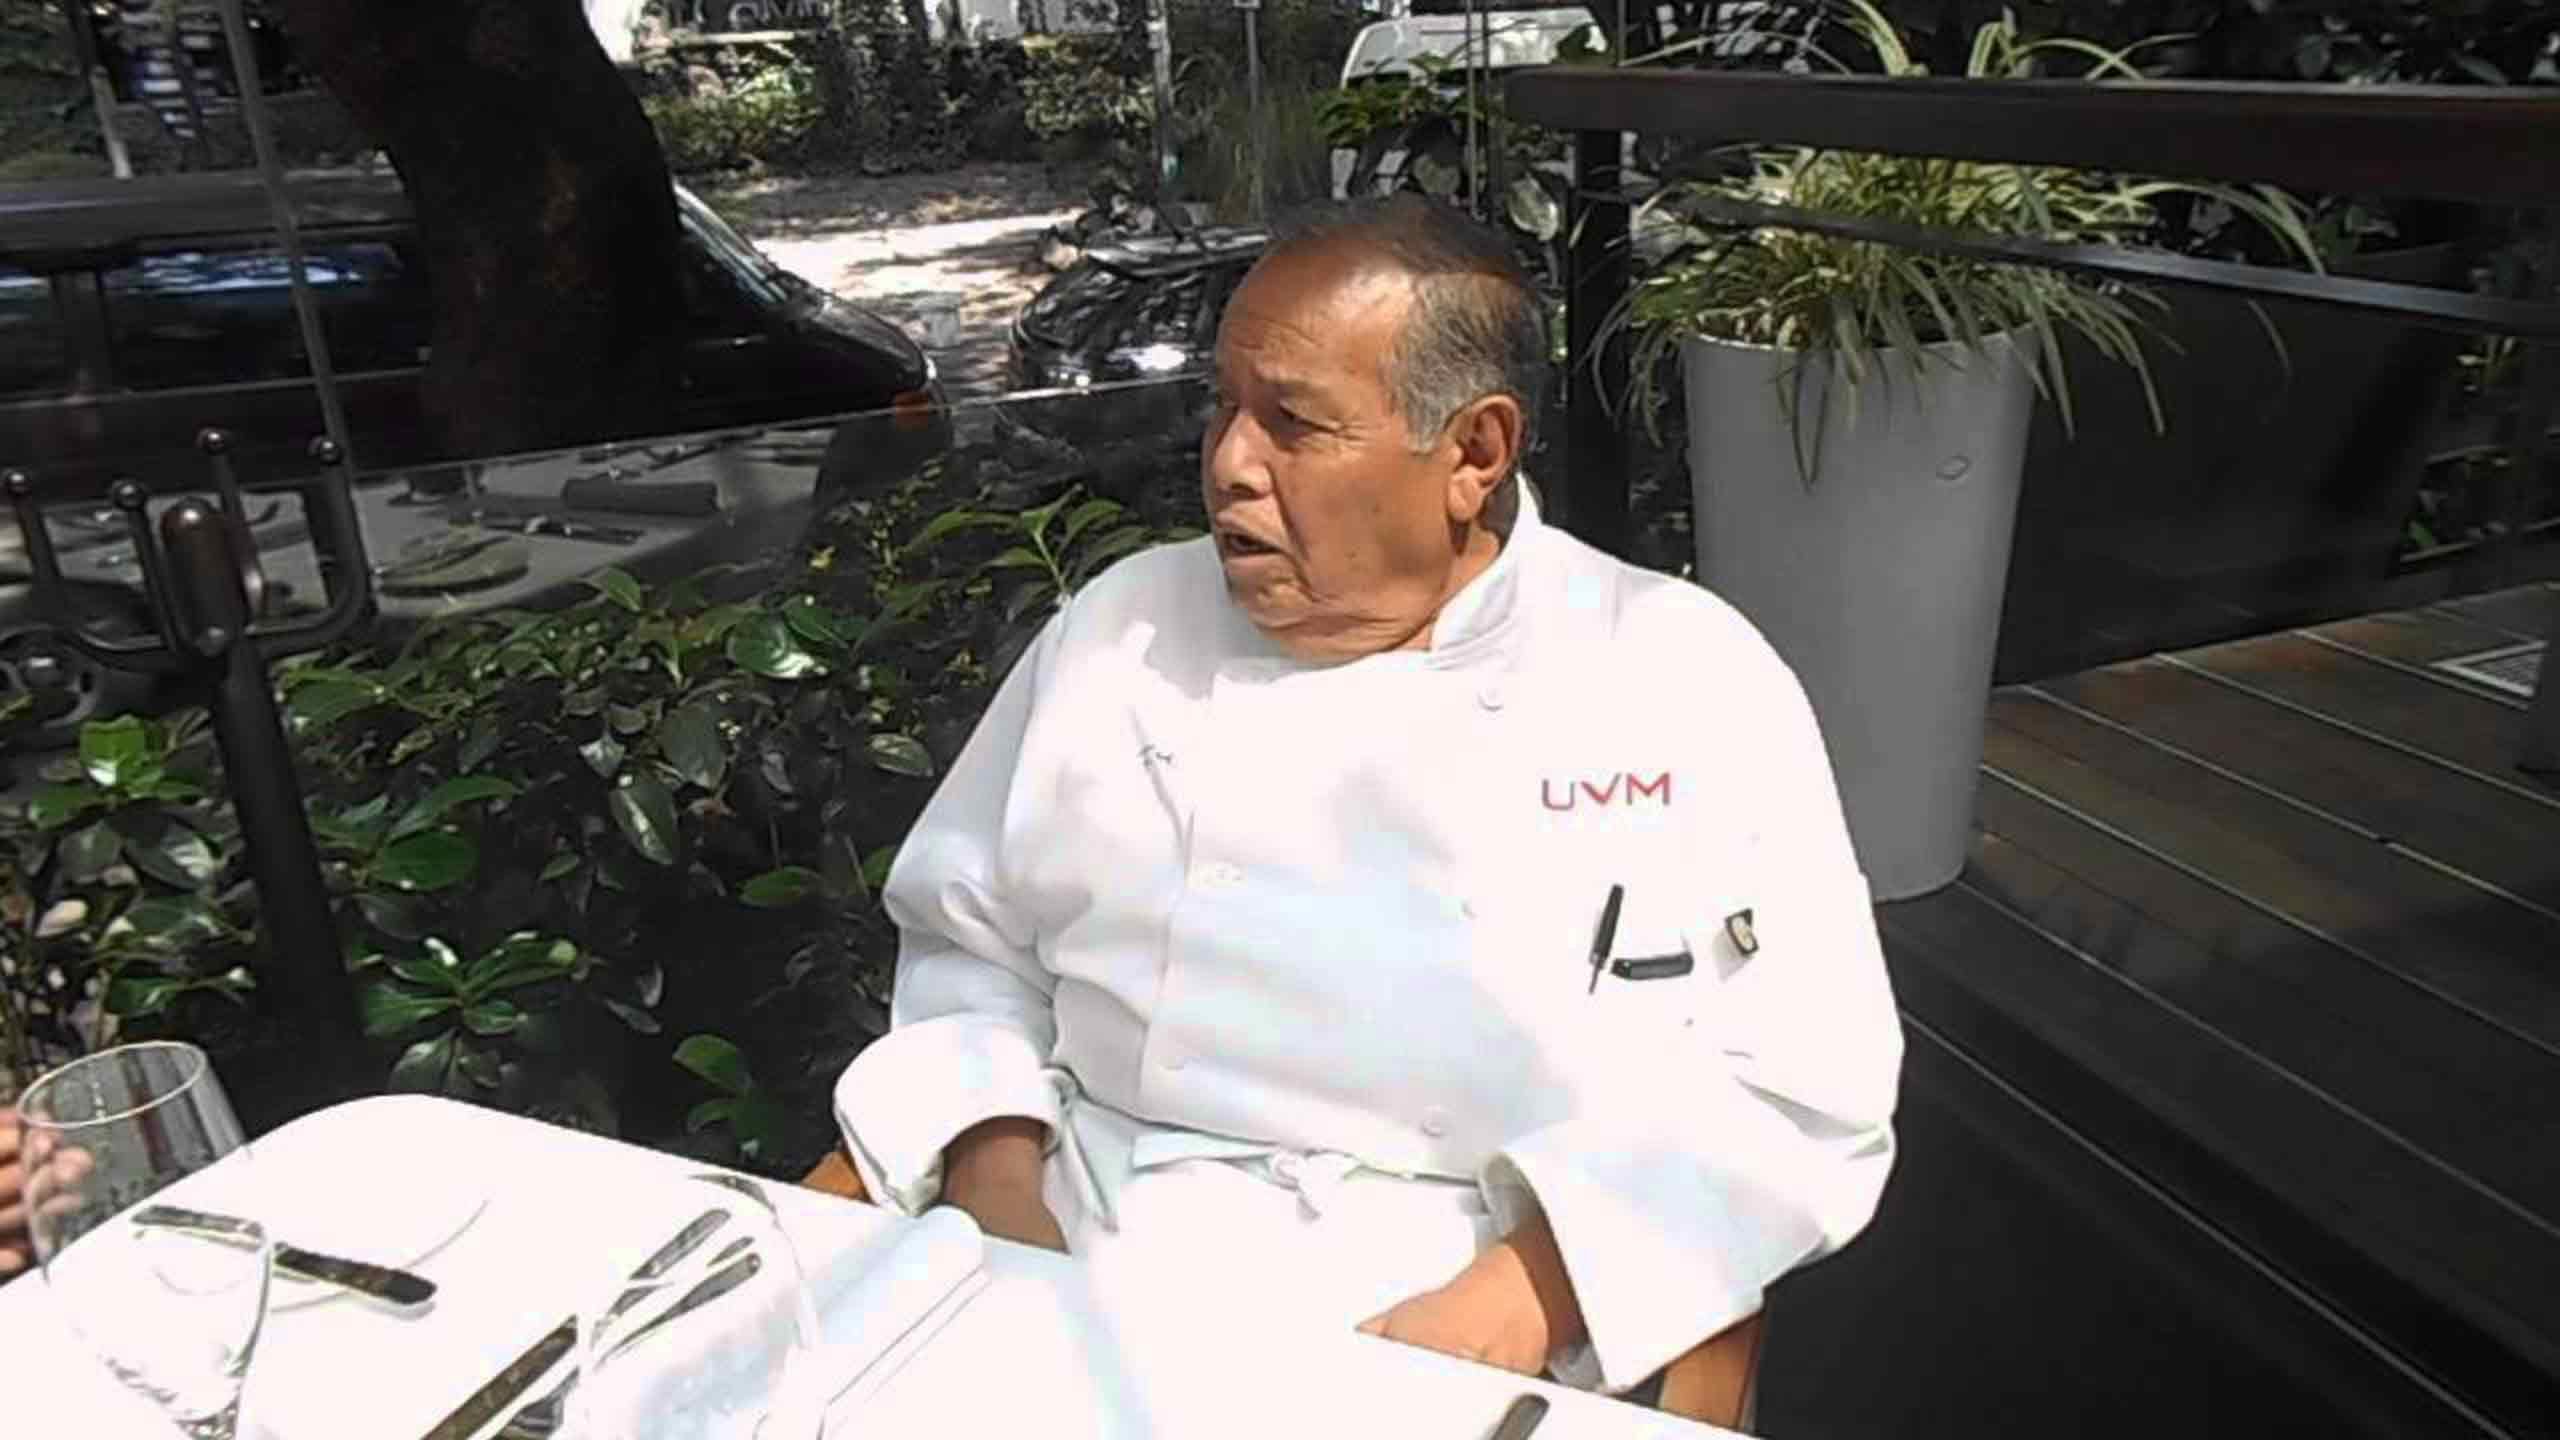 chef alejandro heredia